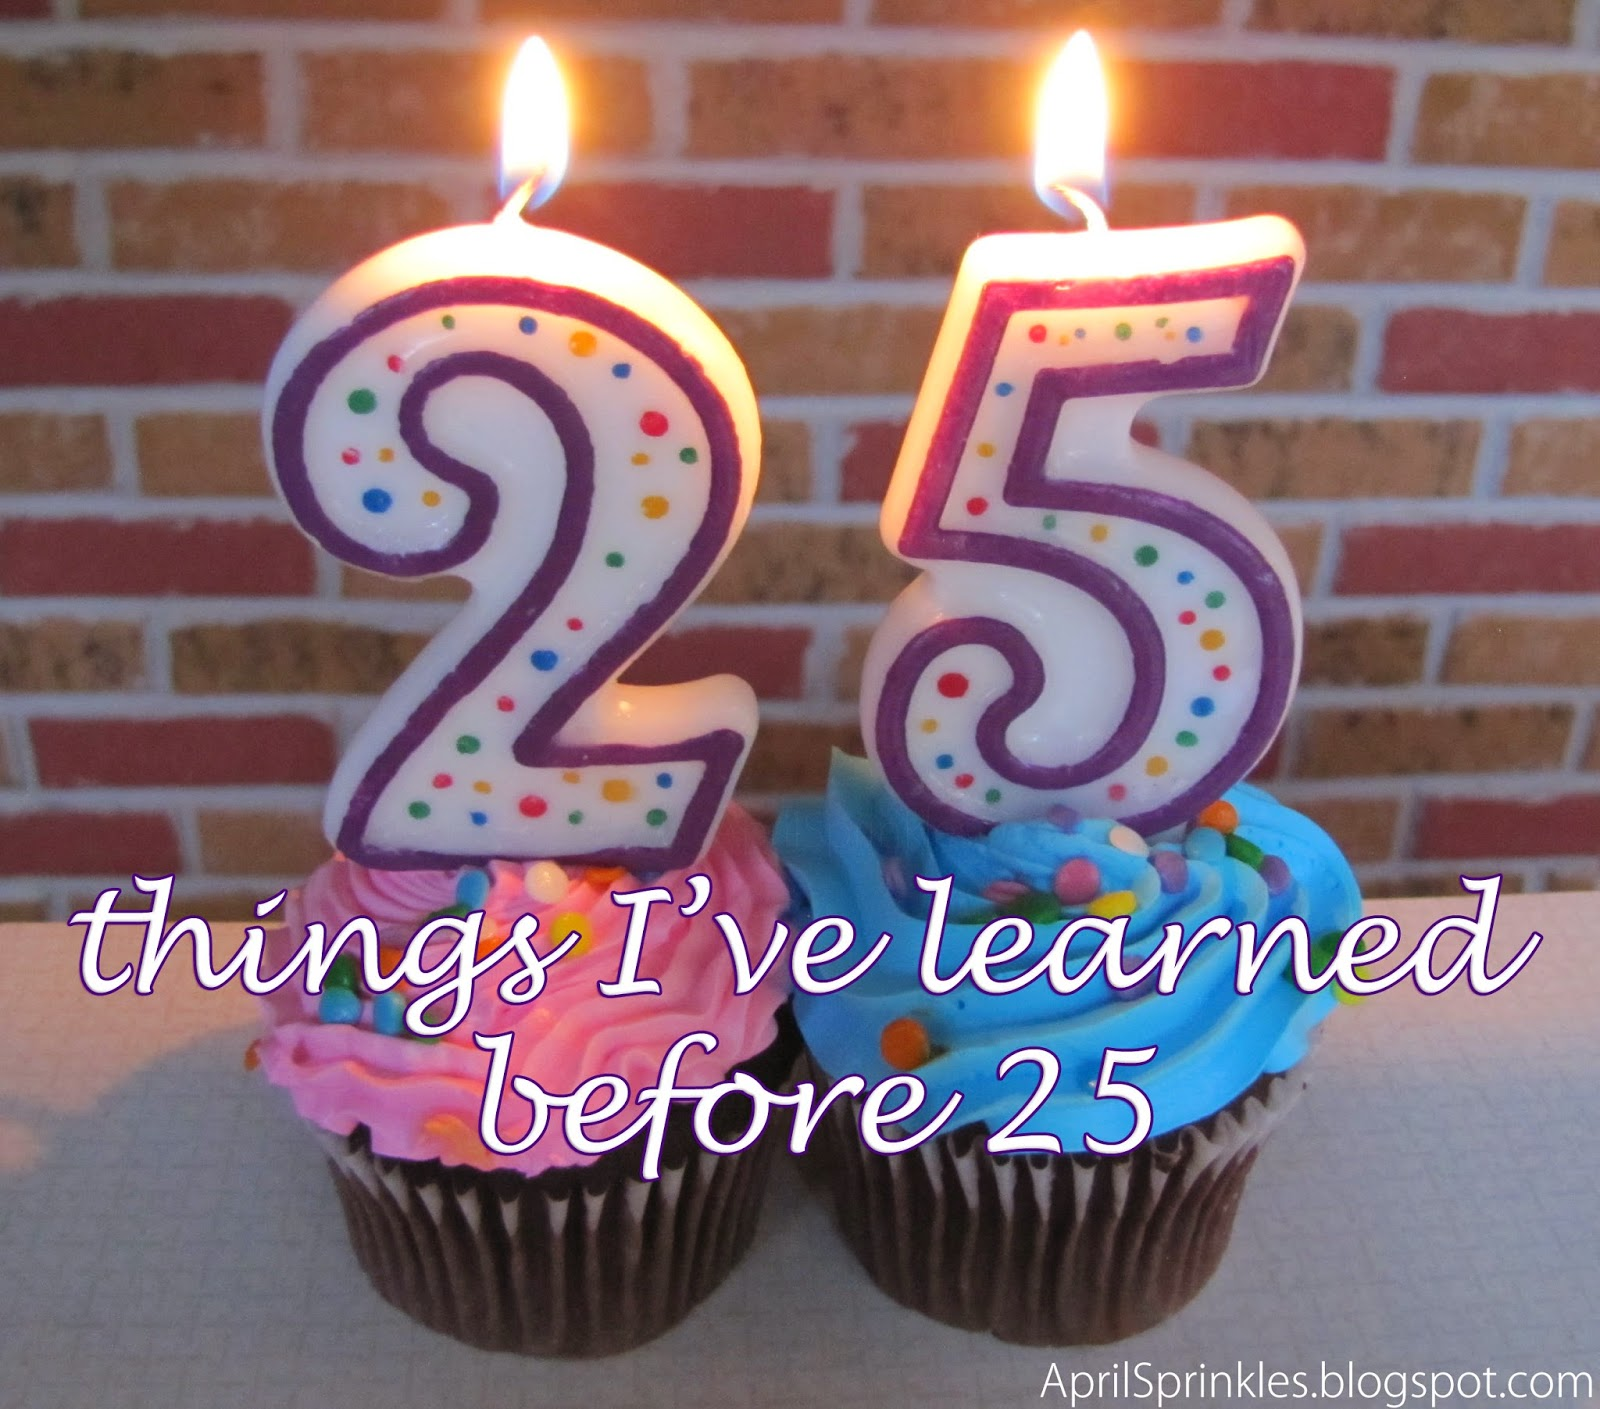 April Sprinkles: 25 things I've learned before 25